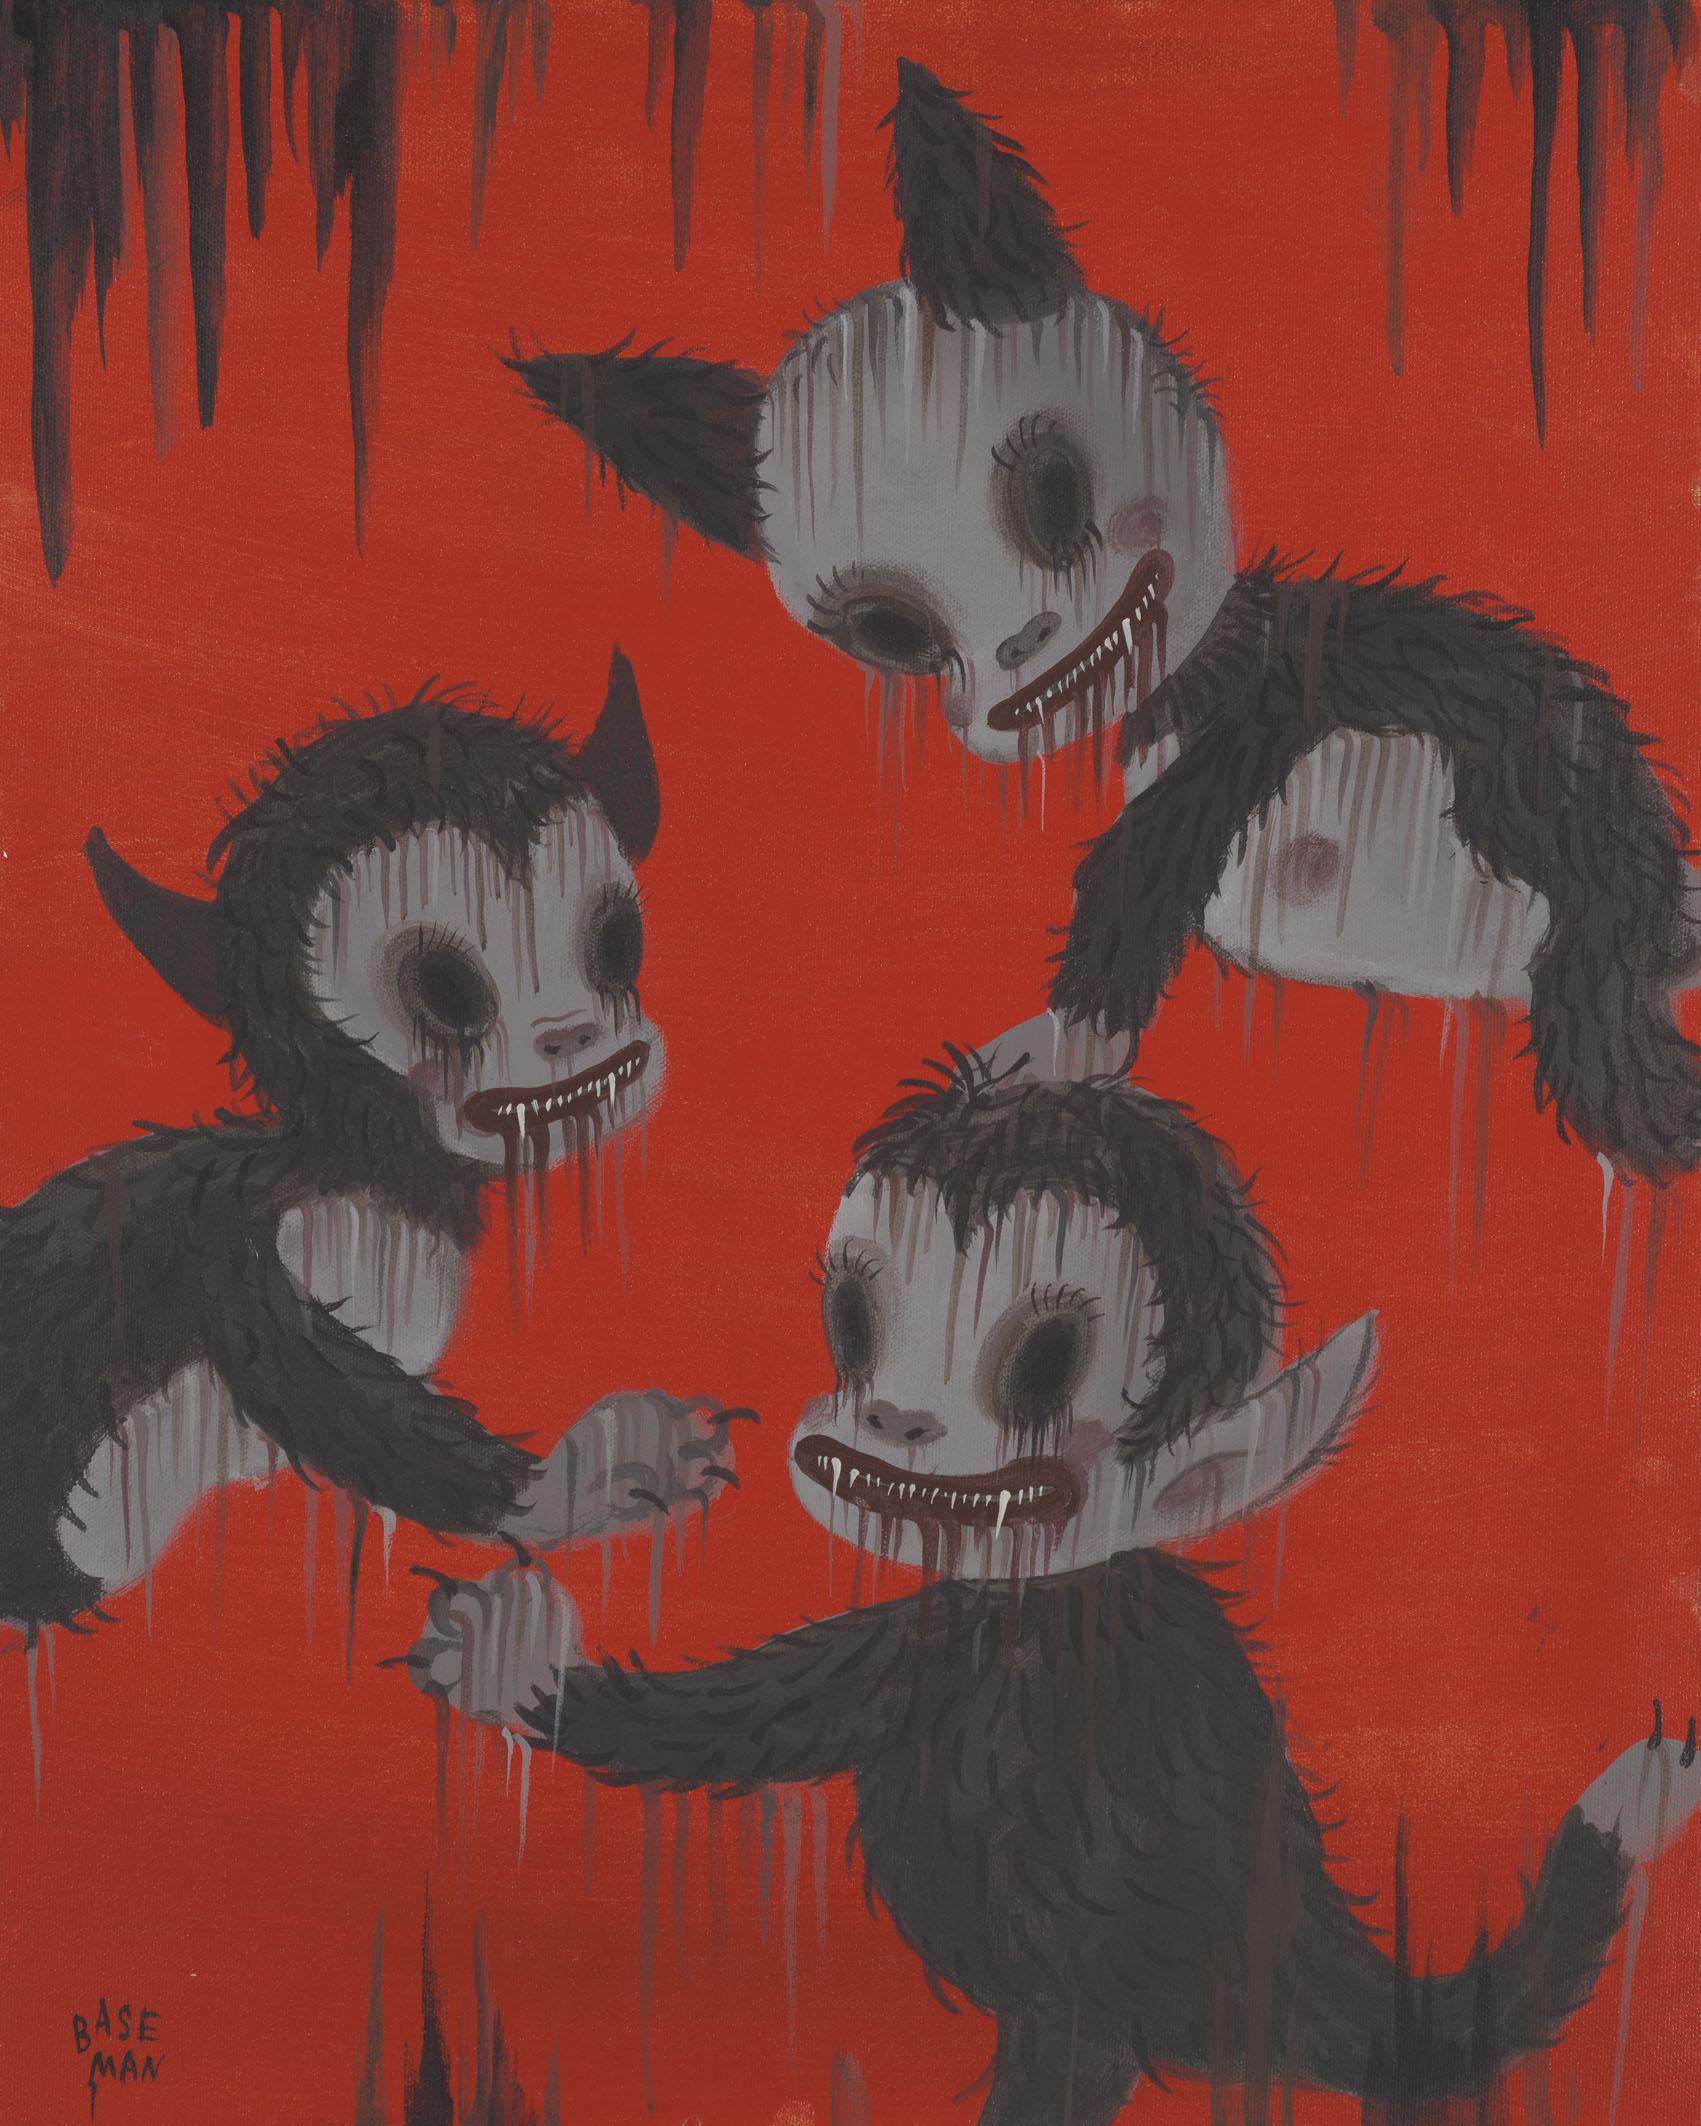 G.Baseman-2012-Delirium-Red-acrilico-su-tela-51-x-41-cm